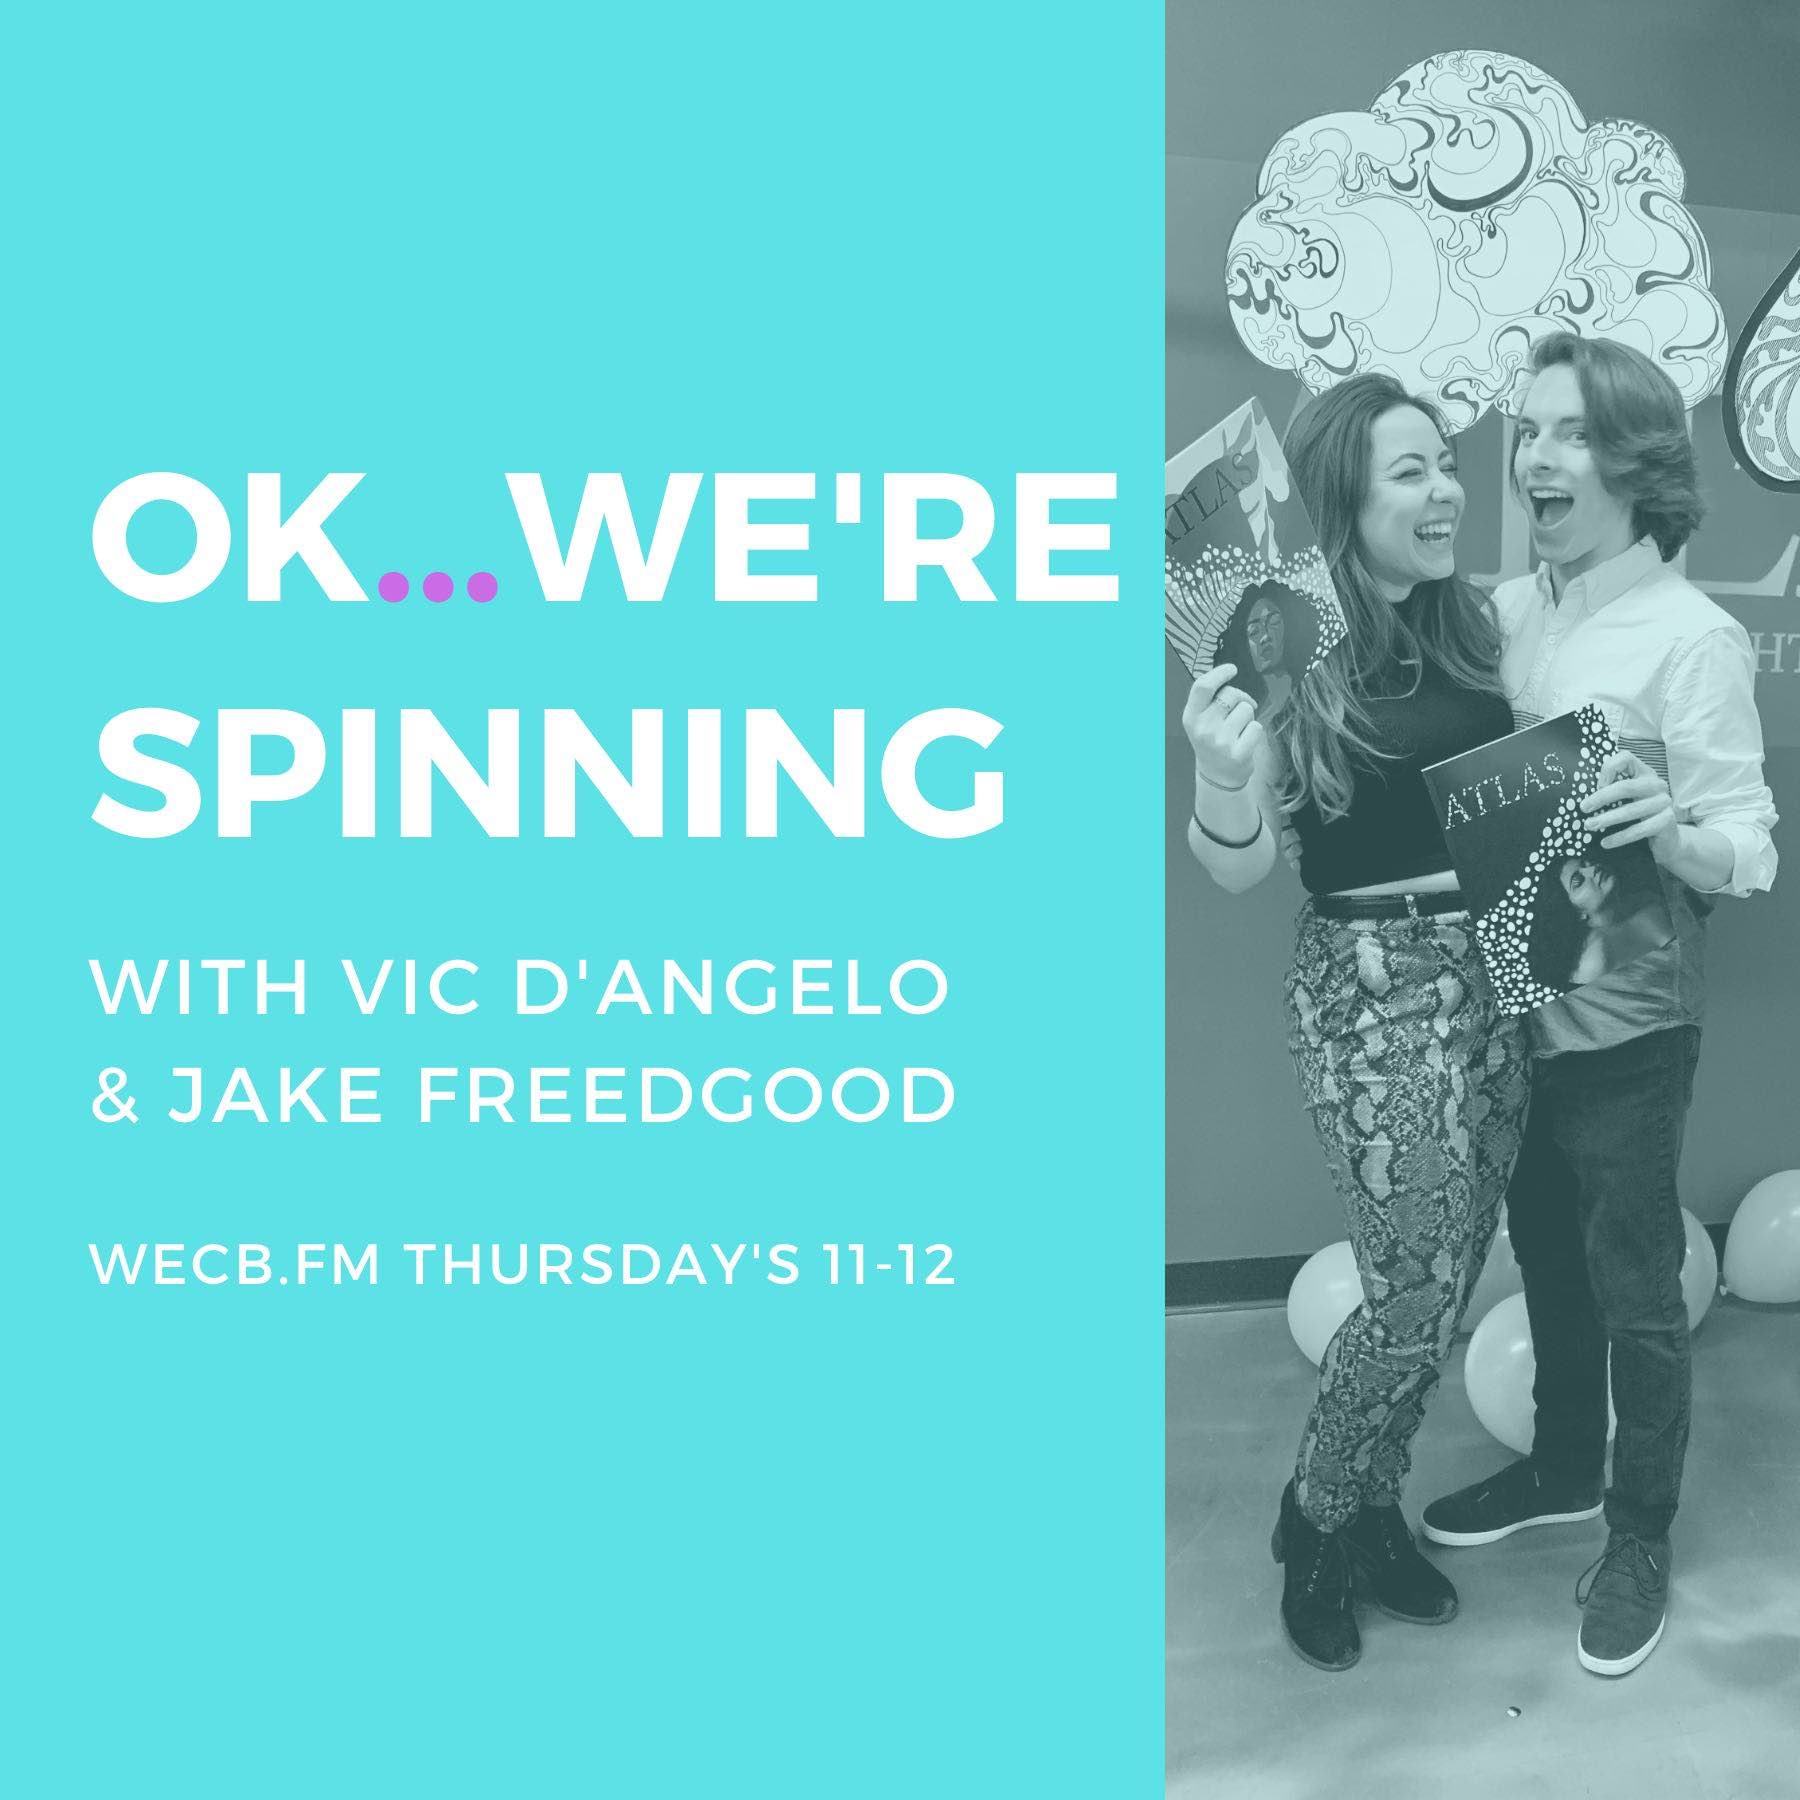 Okay...We're Spinning, radio show on WECB.FM